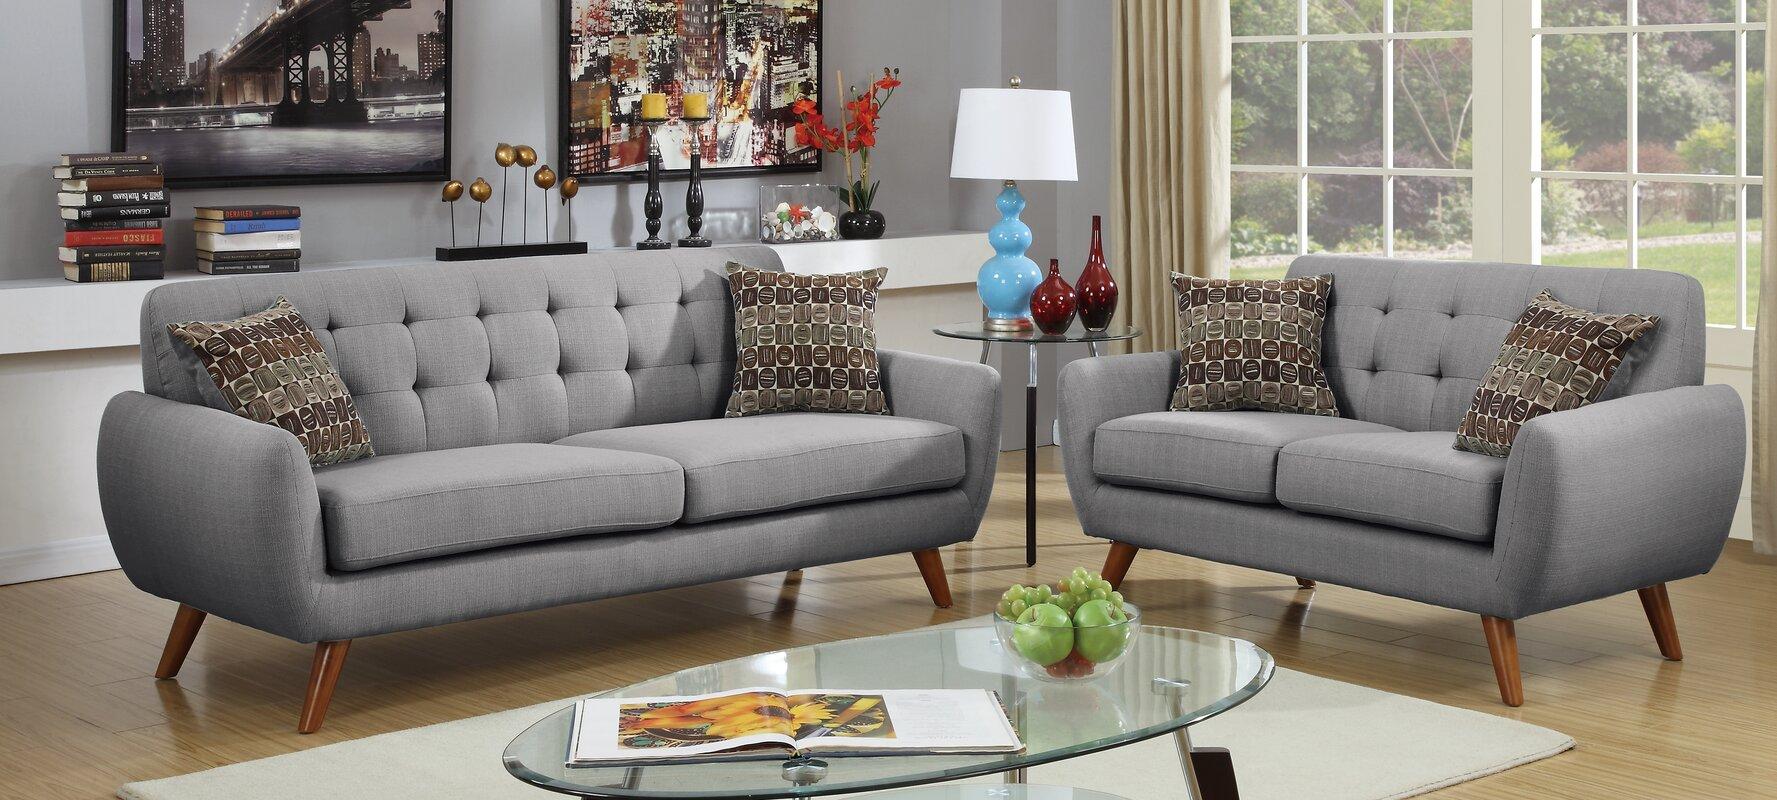 Langley Street Takeo 2 Piece Living Room Set & Reviews | Wayfair